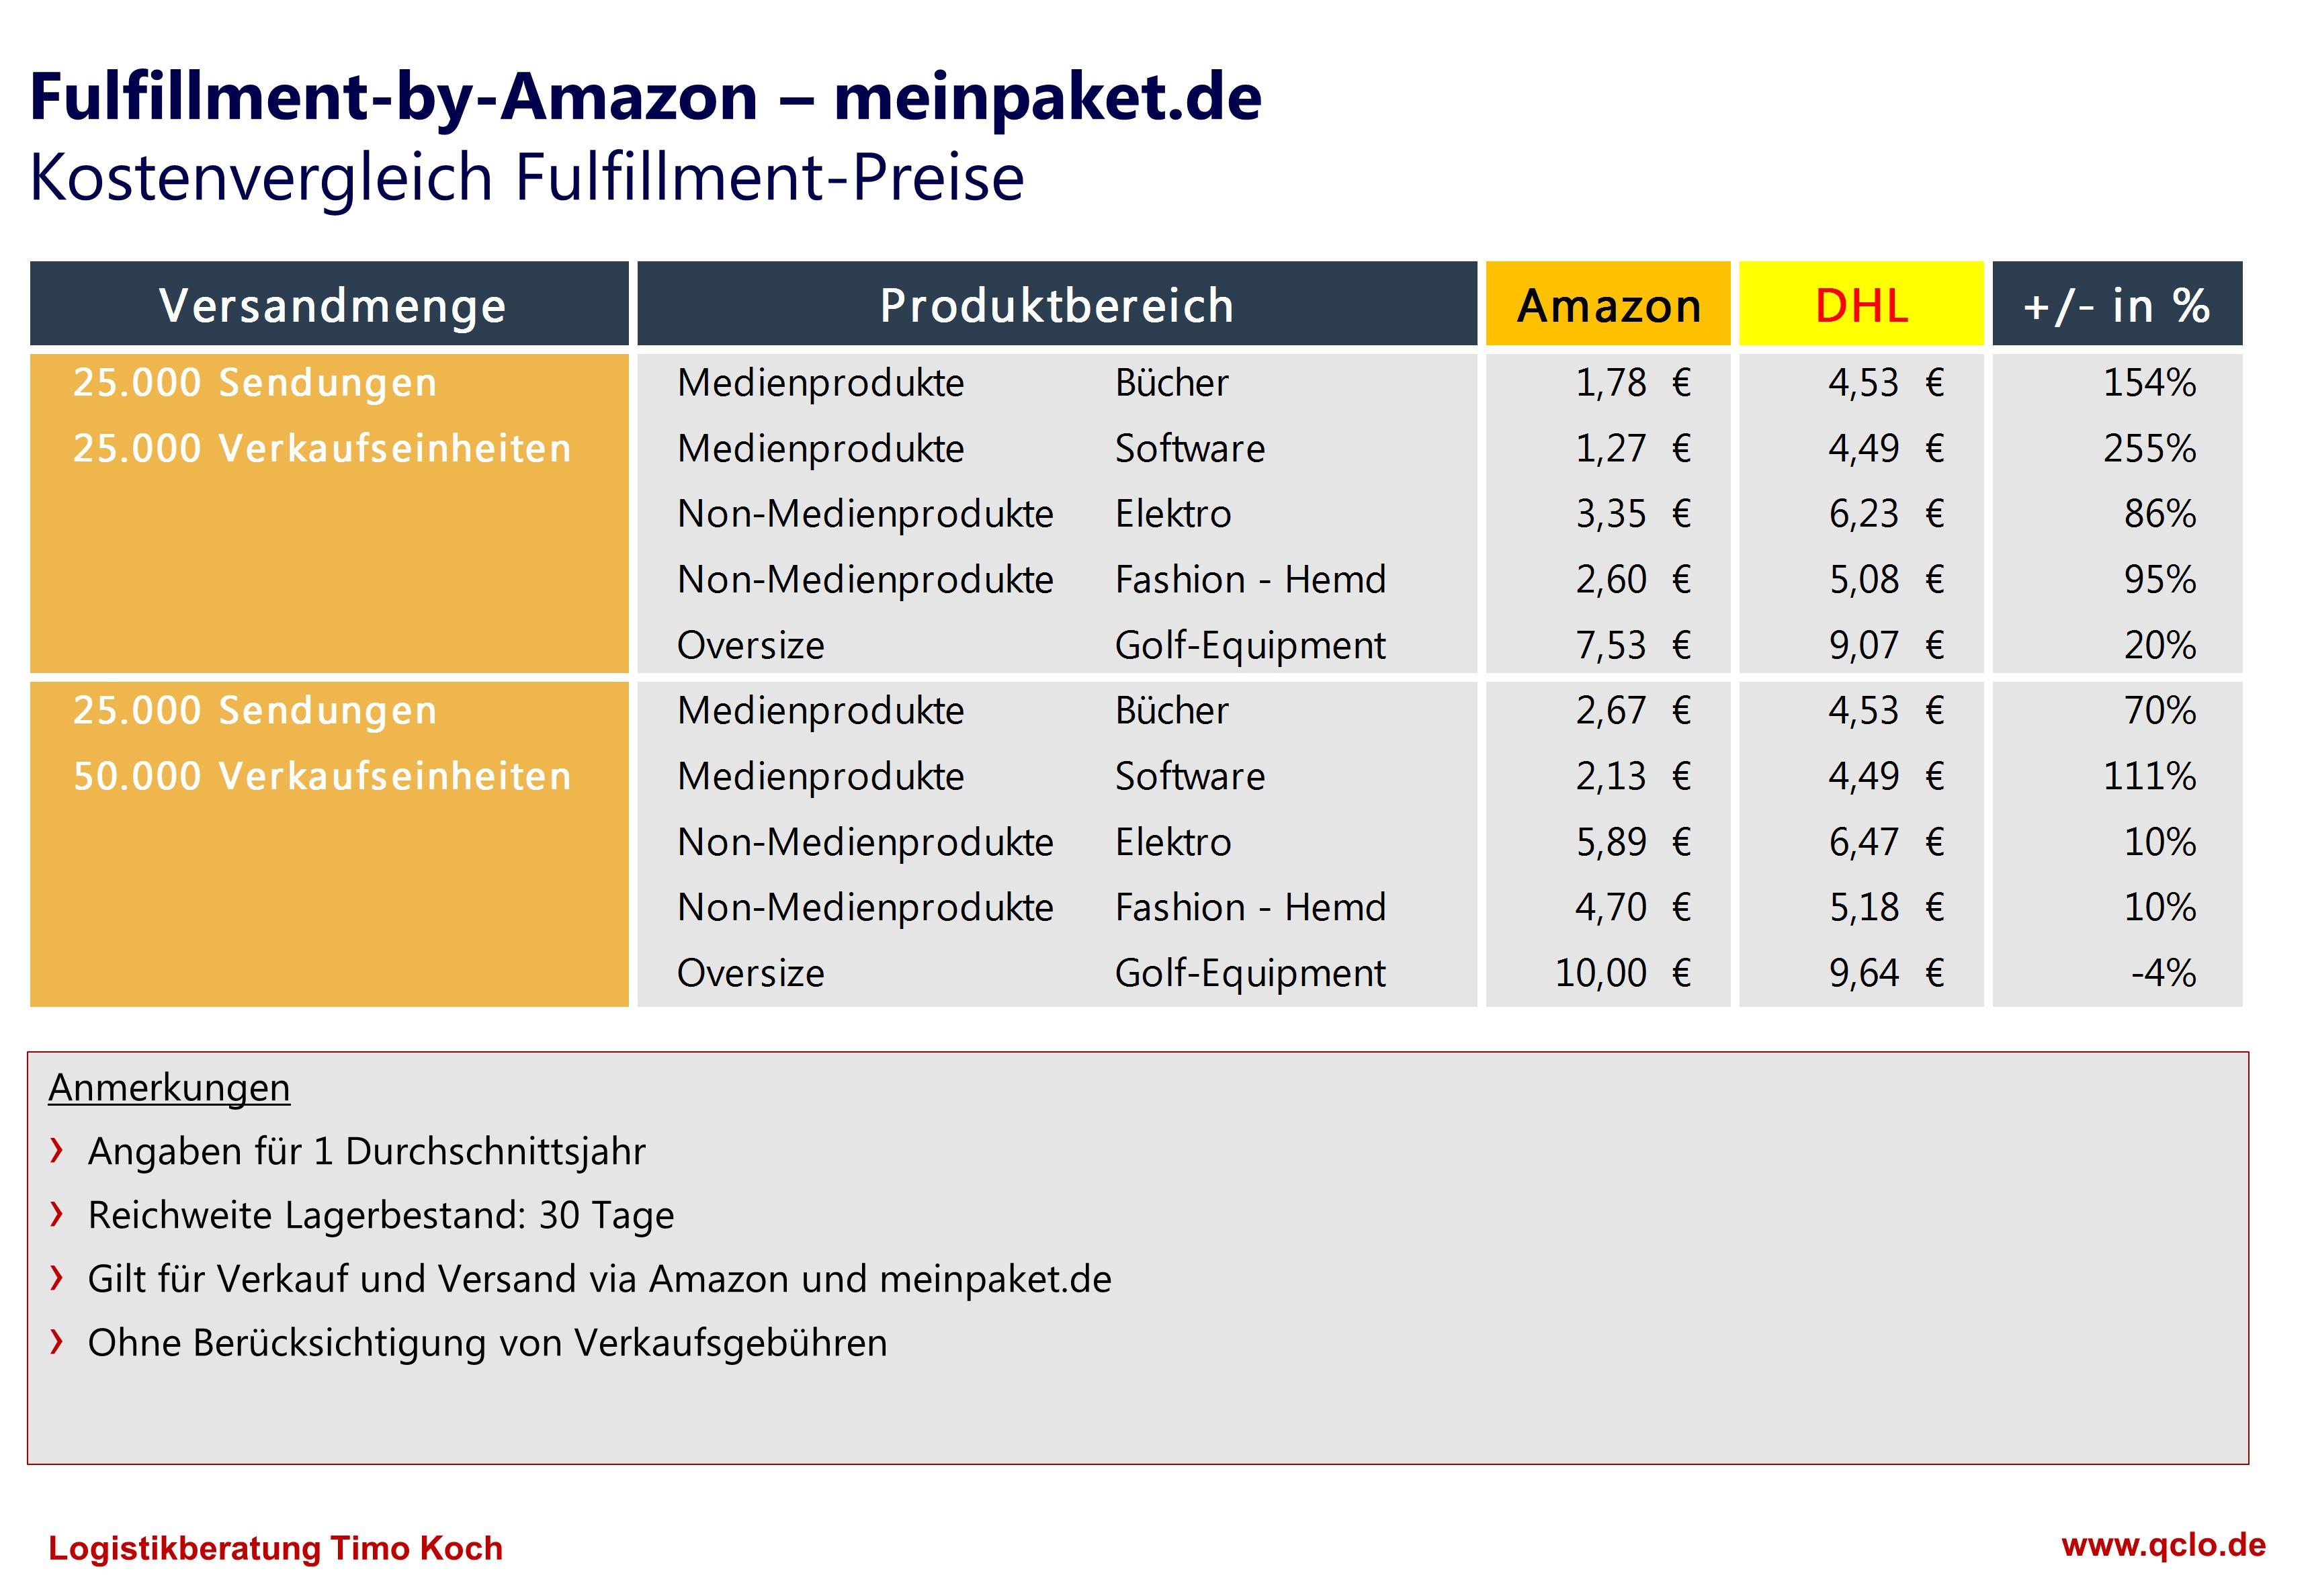 Fulfillment Kosten Vergleich Amazon Vs Meinpaketde